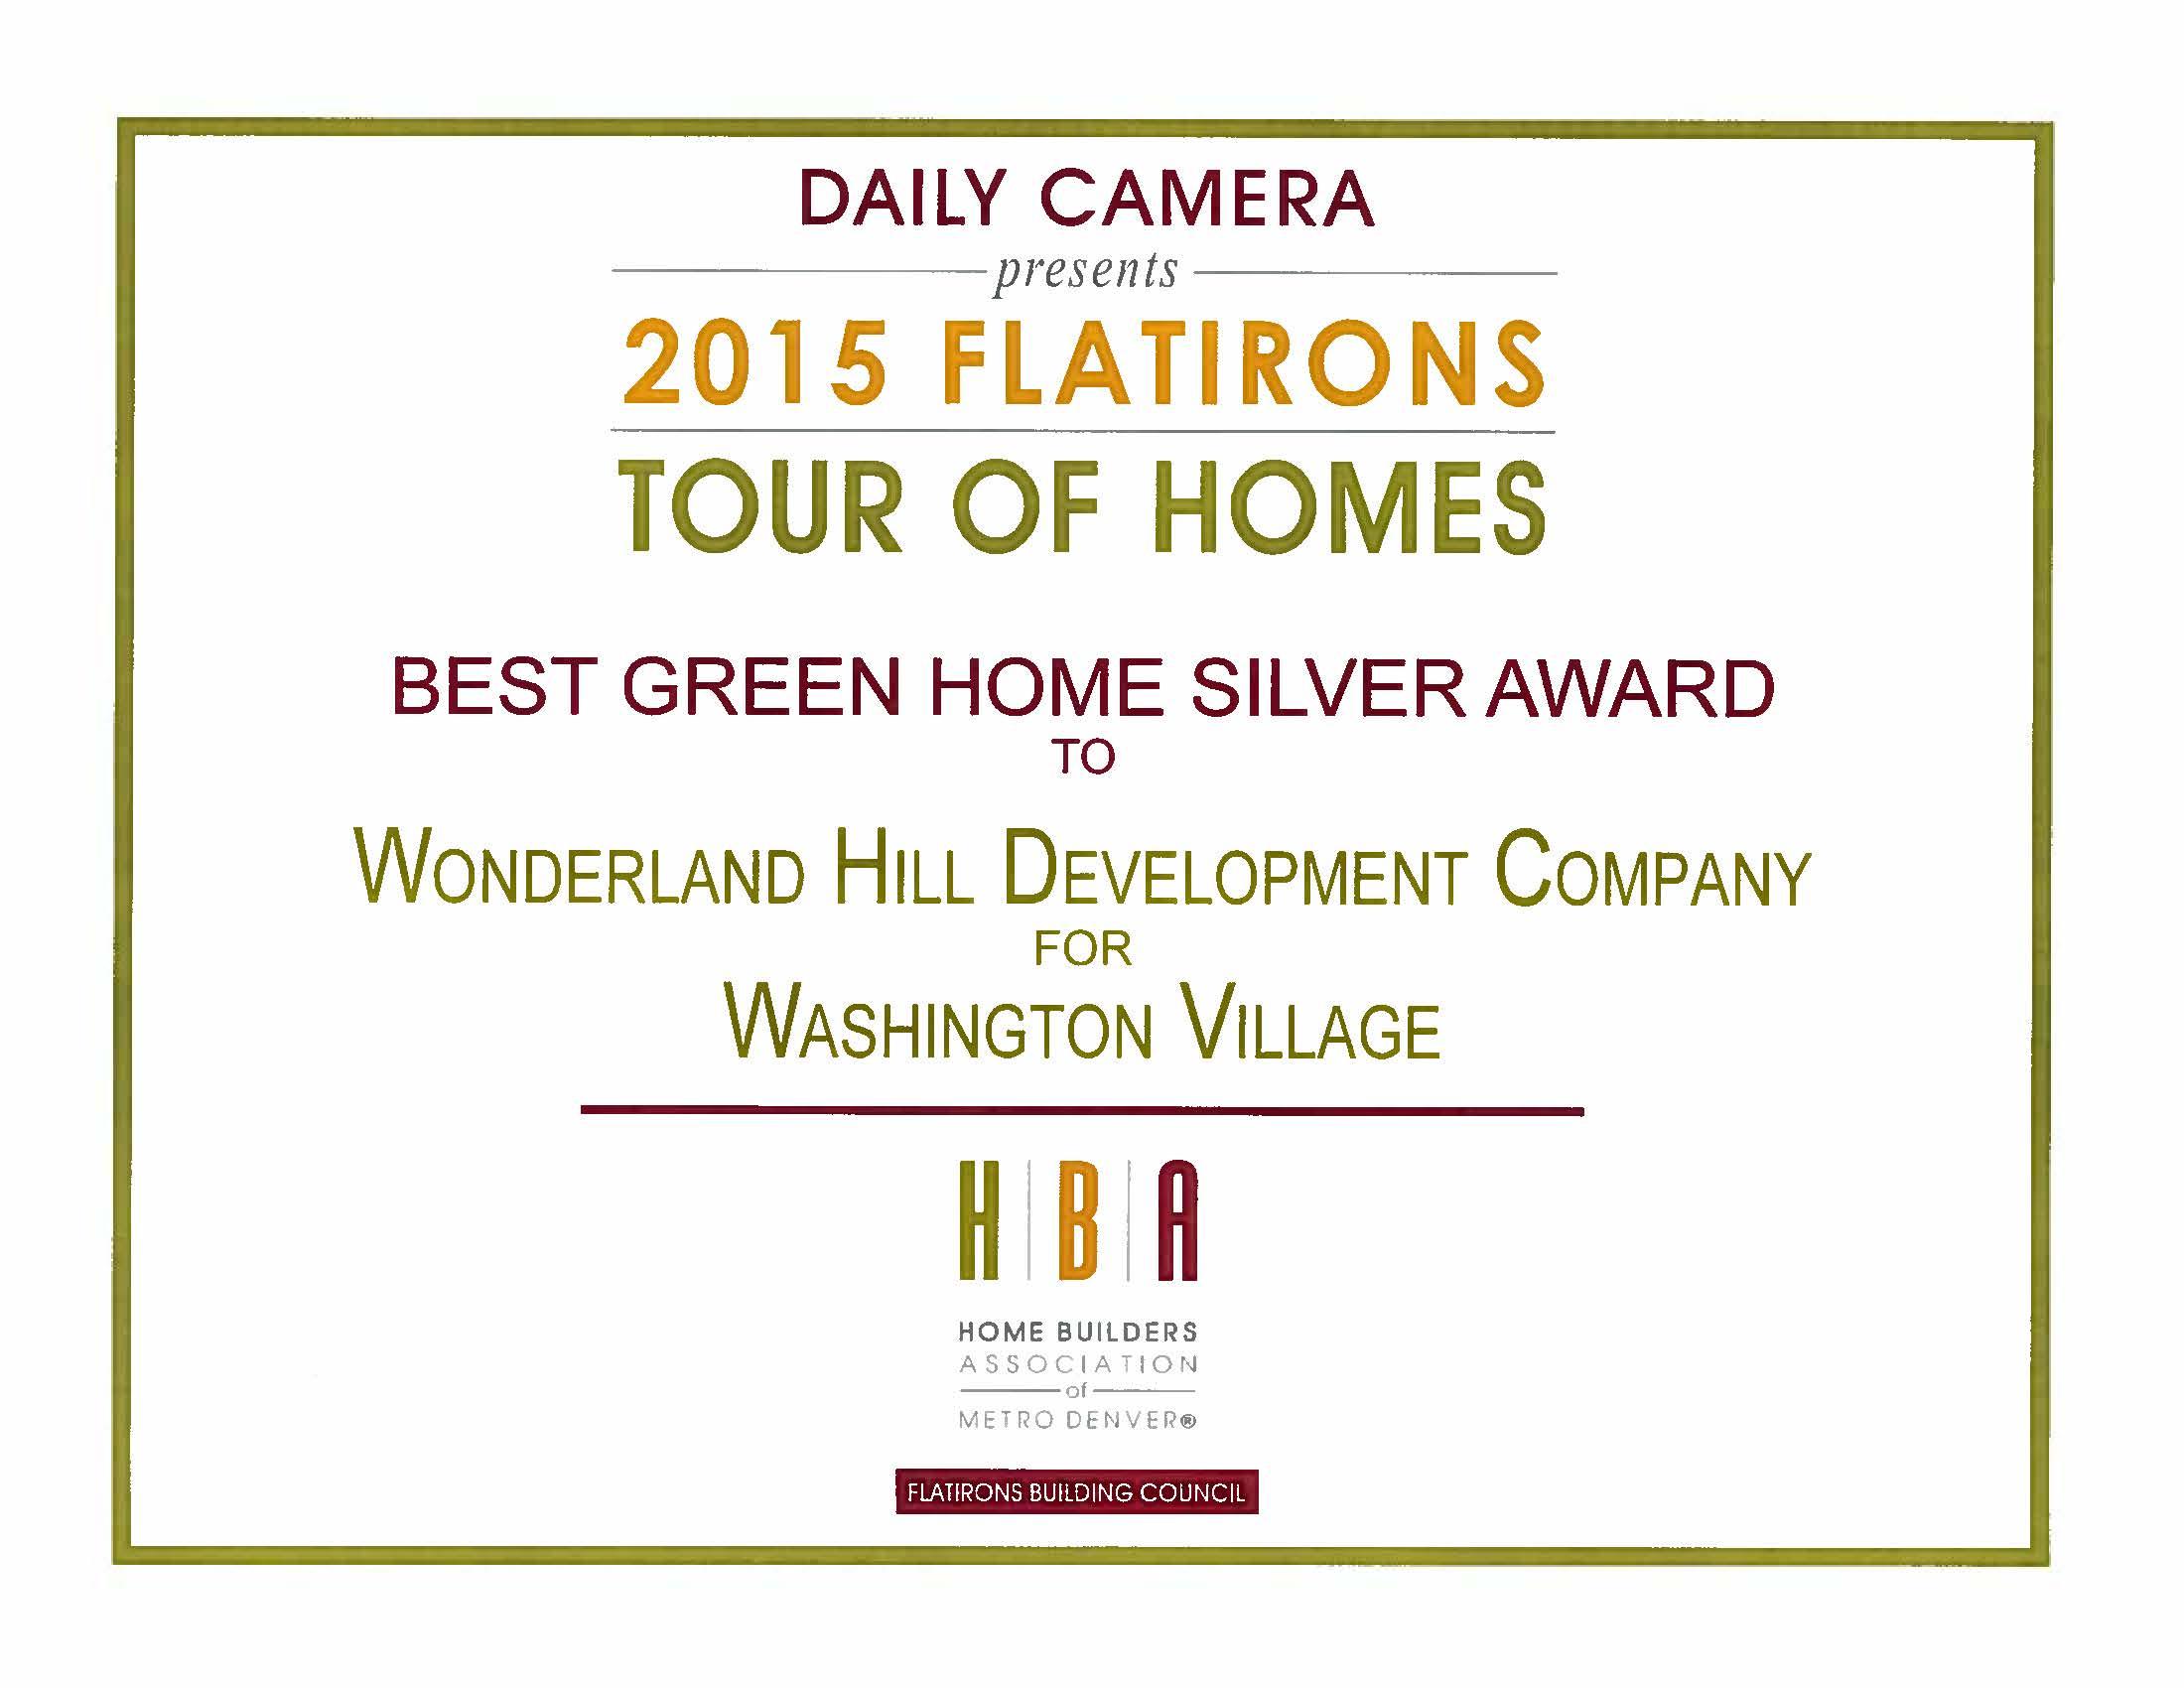 2015 Flatirons Tour of Homes